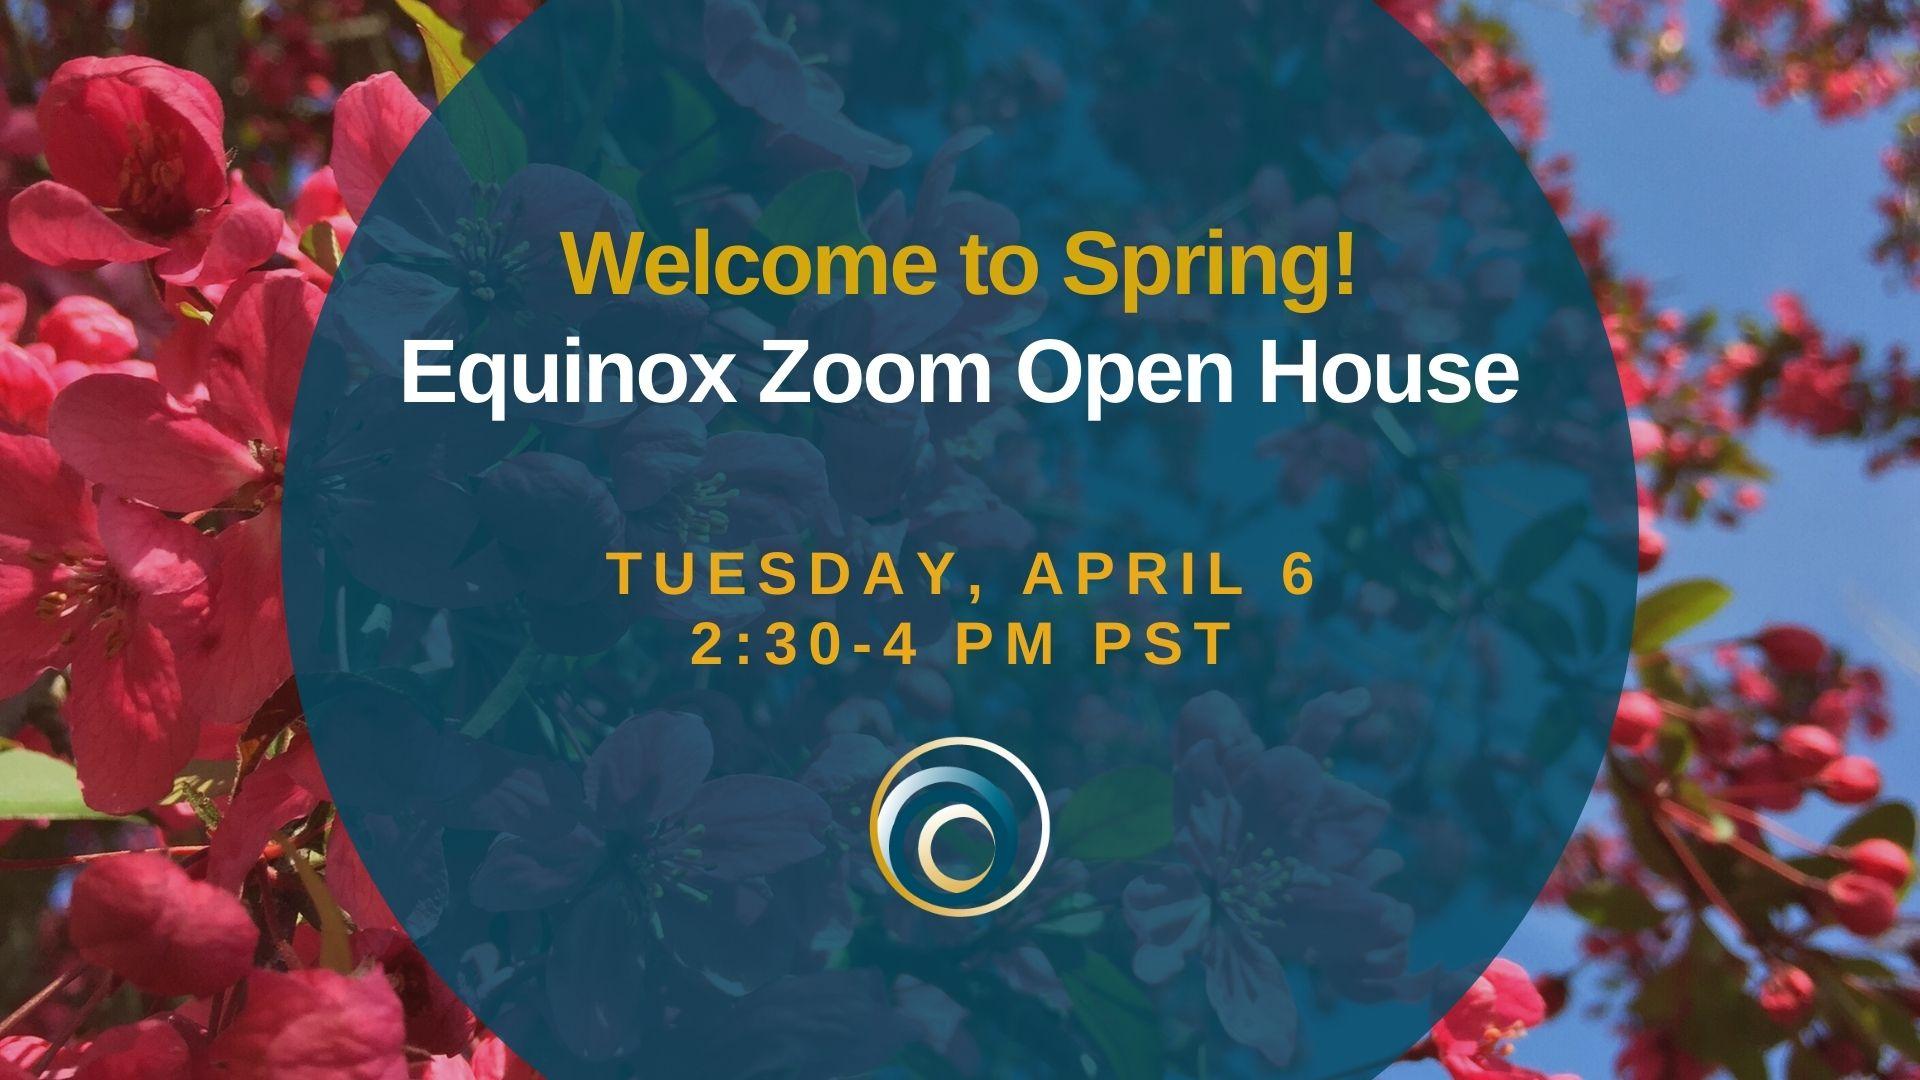 Spring Equinox Zoom Open House